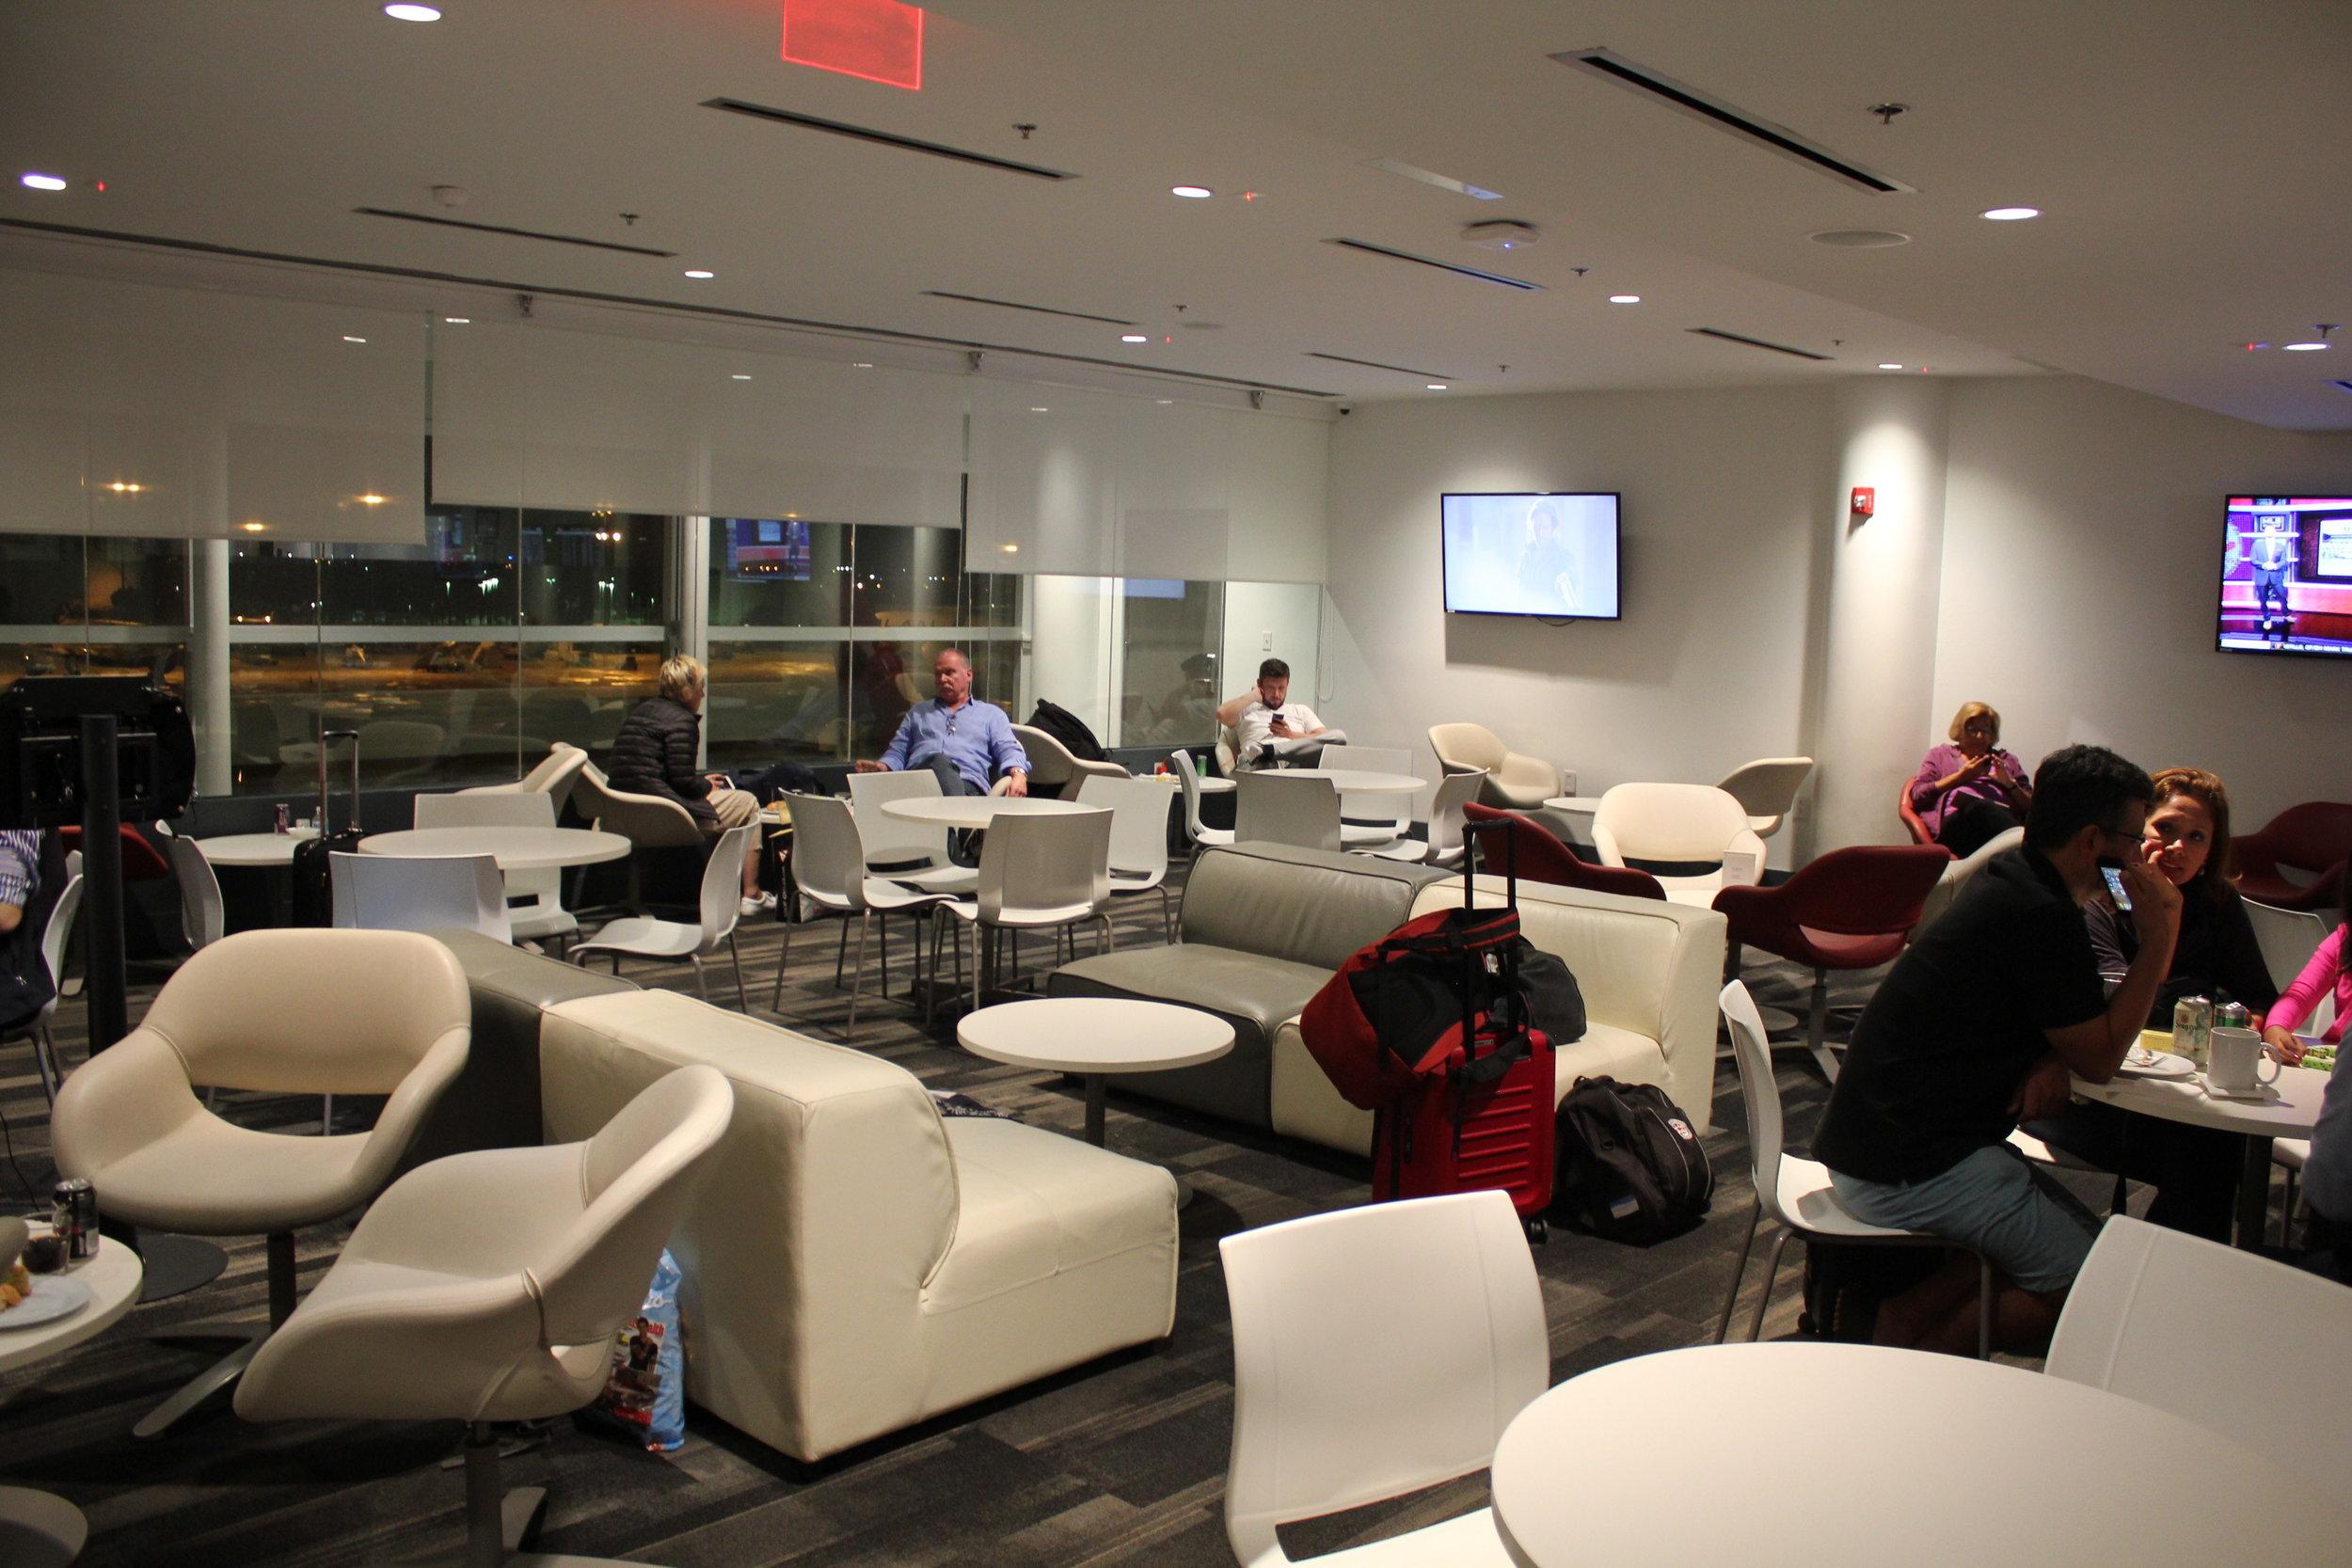 Avianca Lounge Miami – Seating area